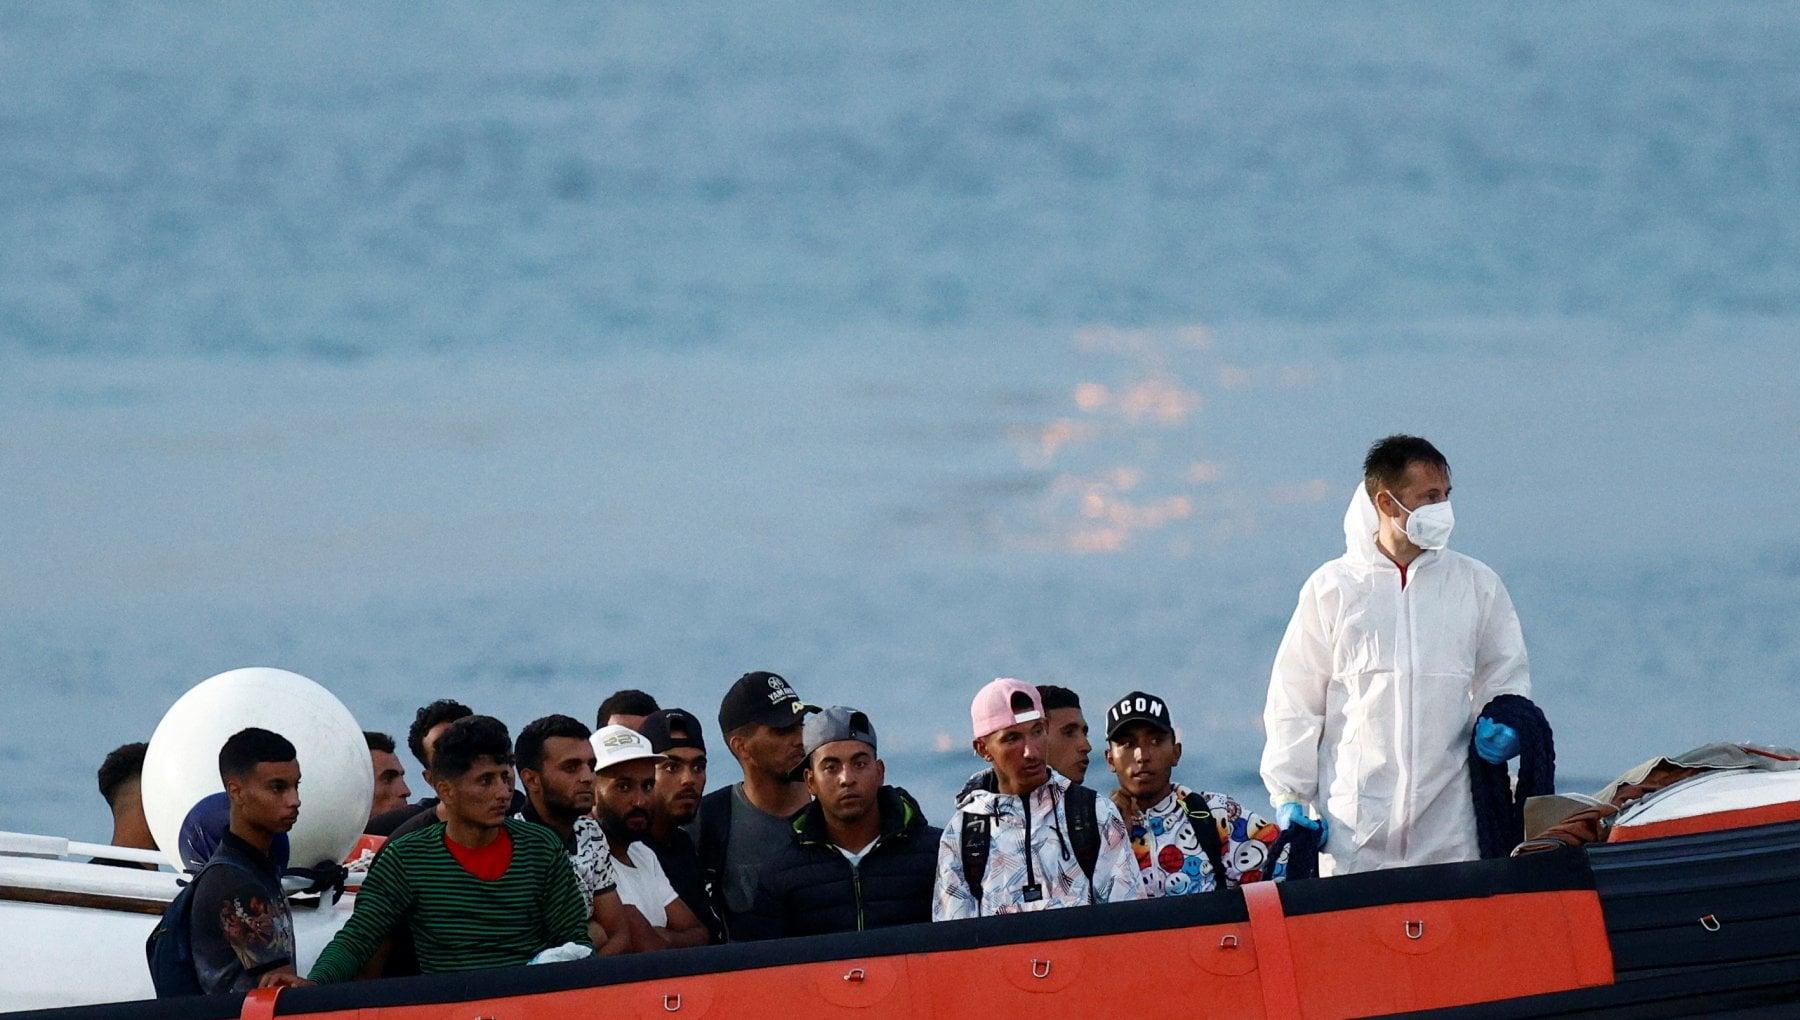 101520505 9bf25d3a aefb 4b1b 860c 4397b0777b75 - Lampedusa, 233 migranti sbarcano sull'isola